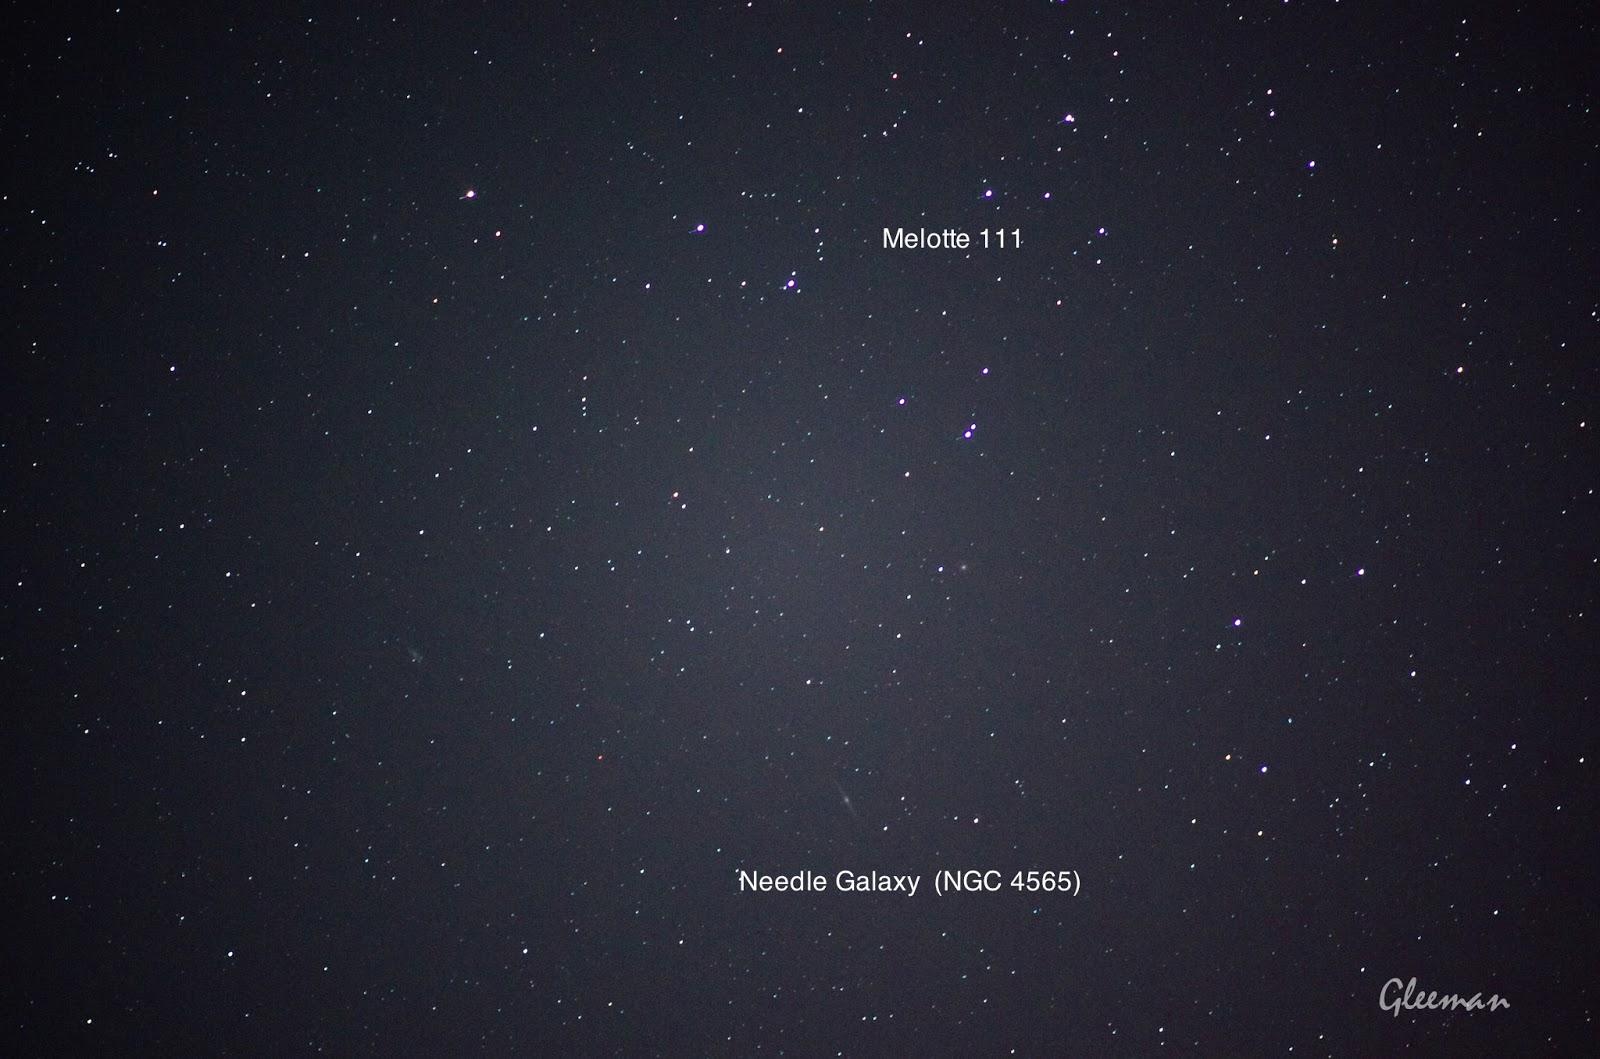 Melotte 111星團,  Needle Galaxy (NGC 4565) 針之星系/ Pentax  K5 + Pentax O-GPS1 + DA*200